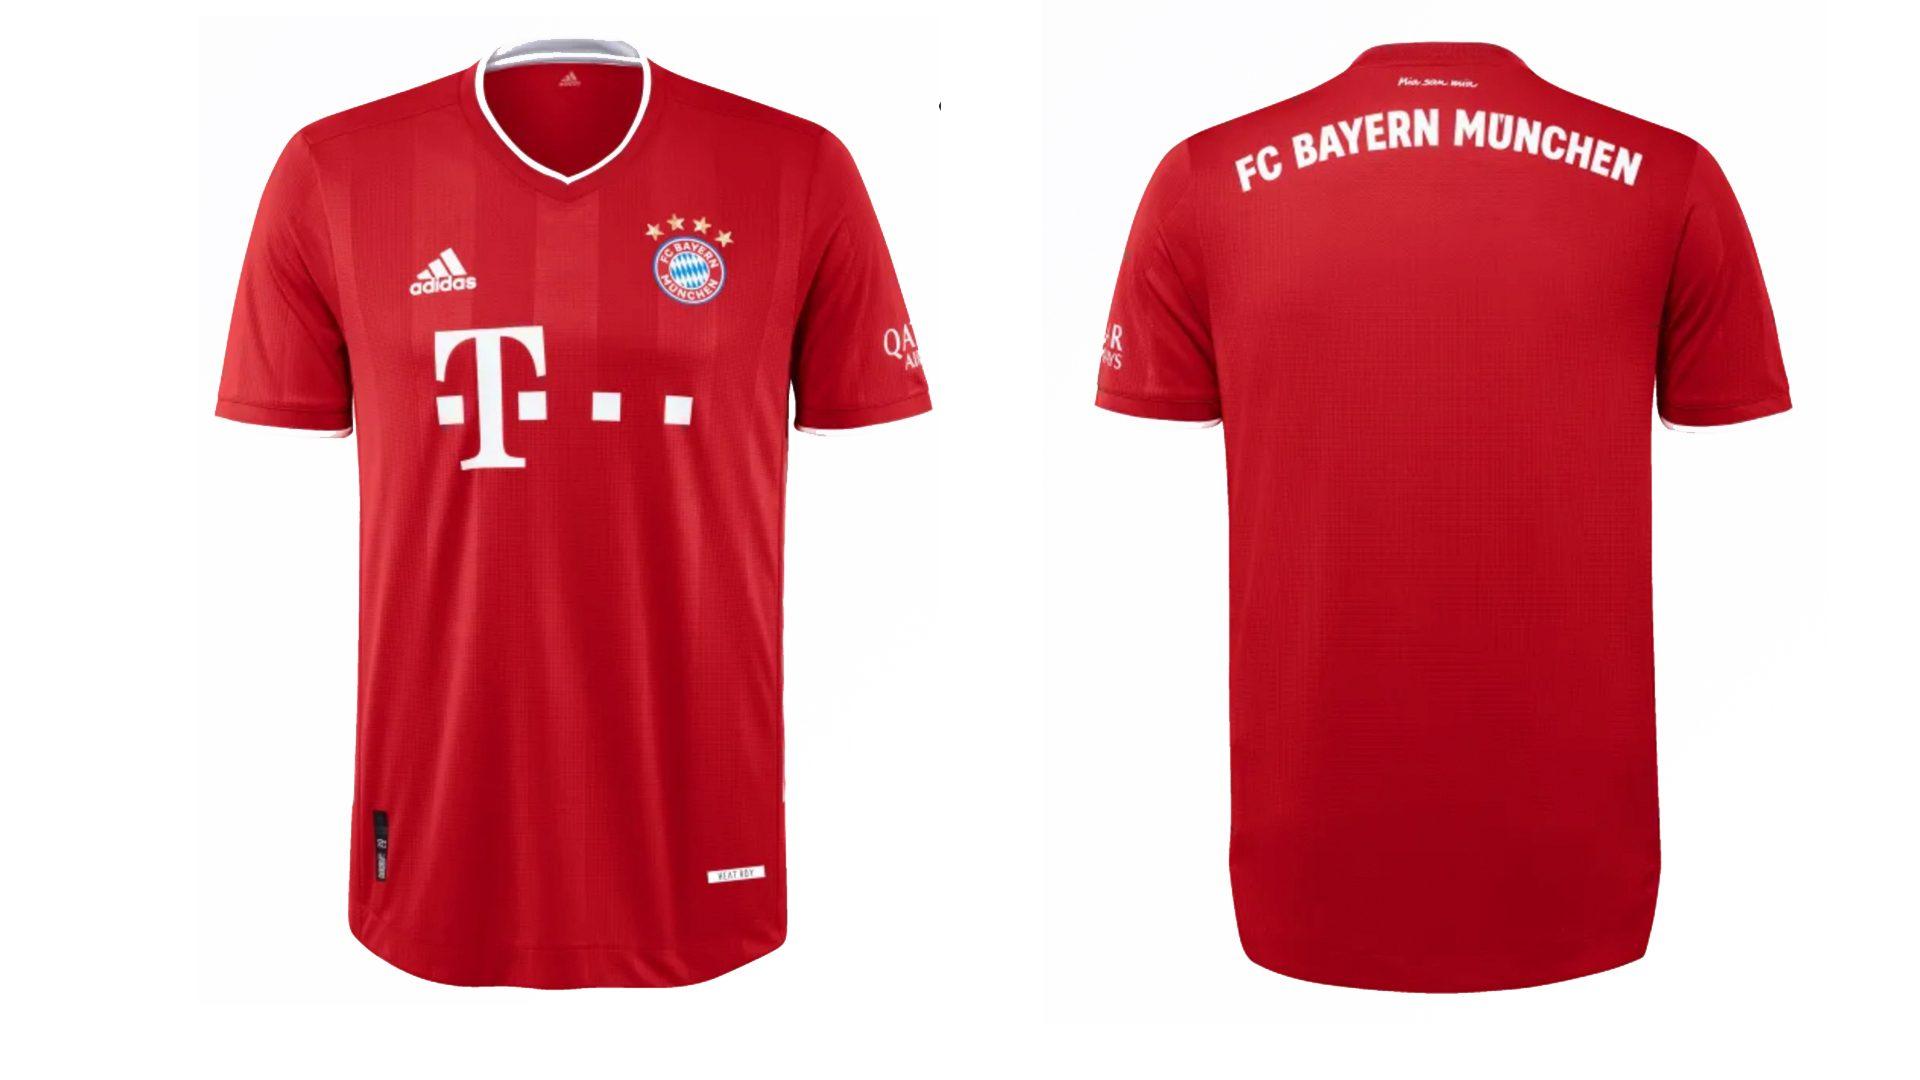 Nueva camiseta local FC Bayern München